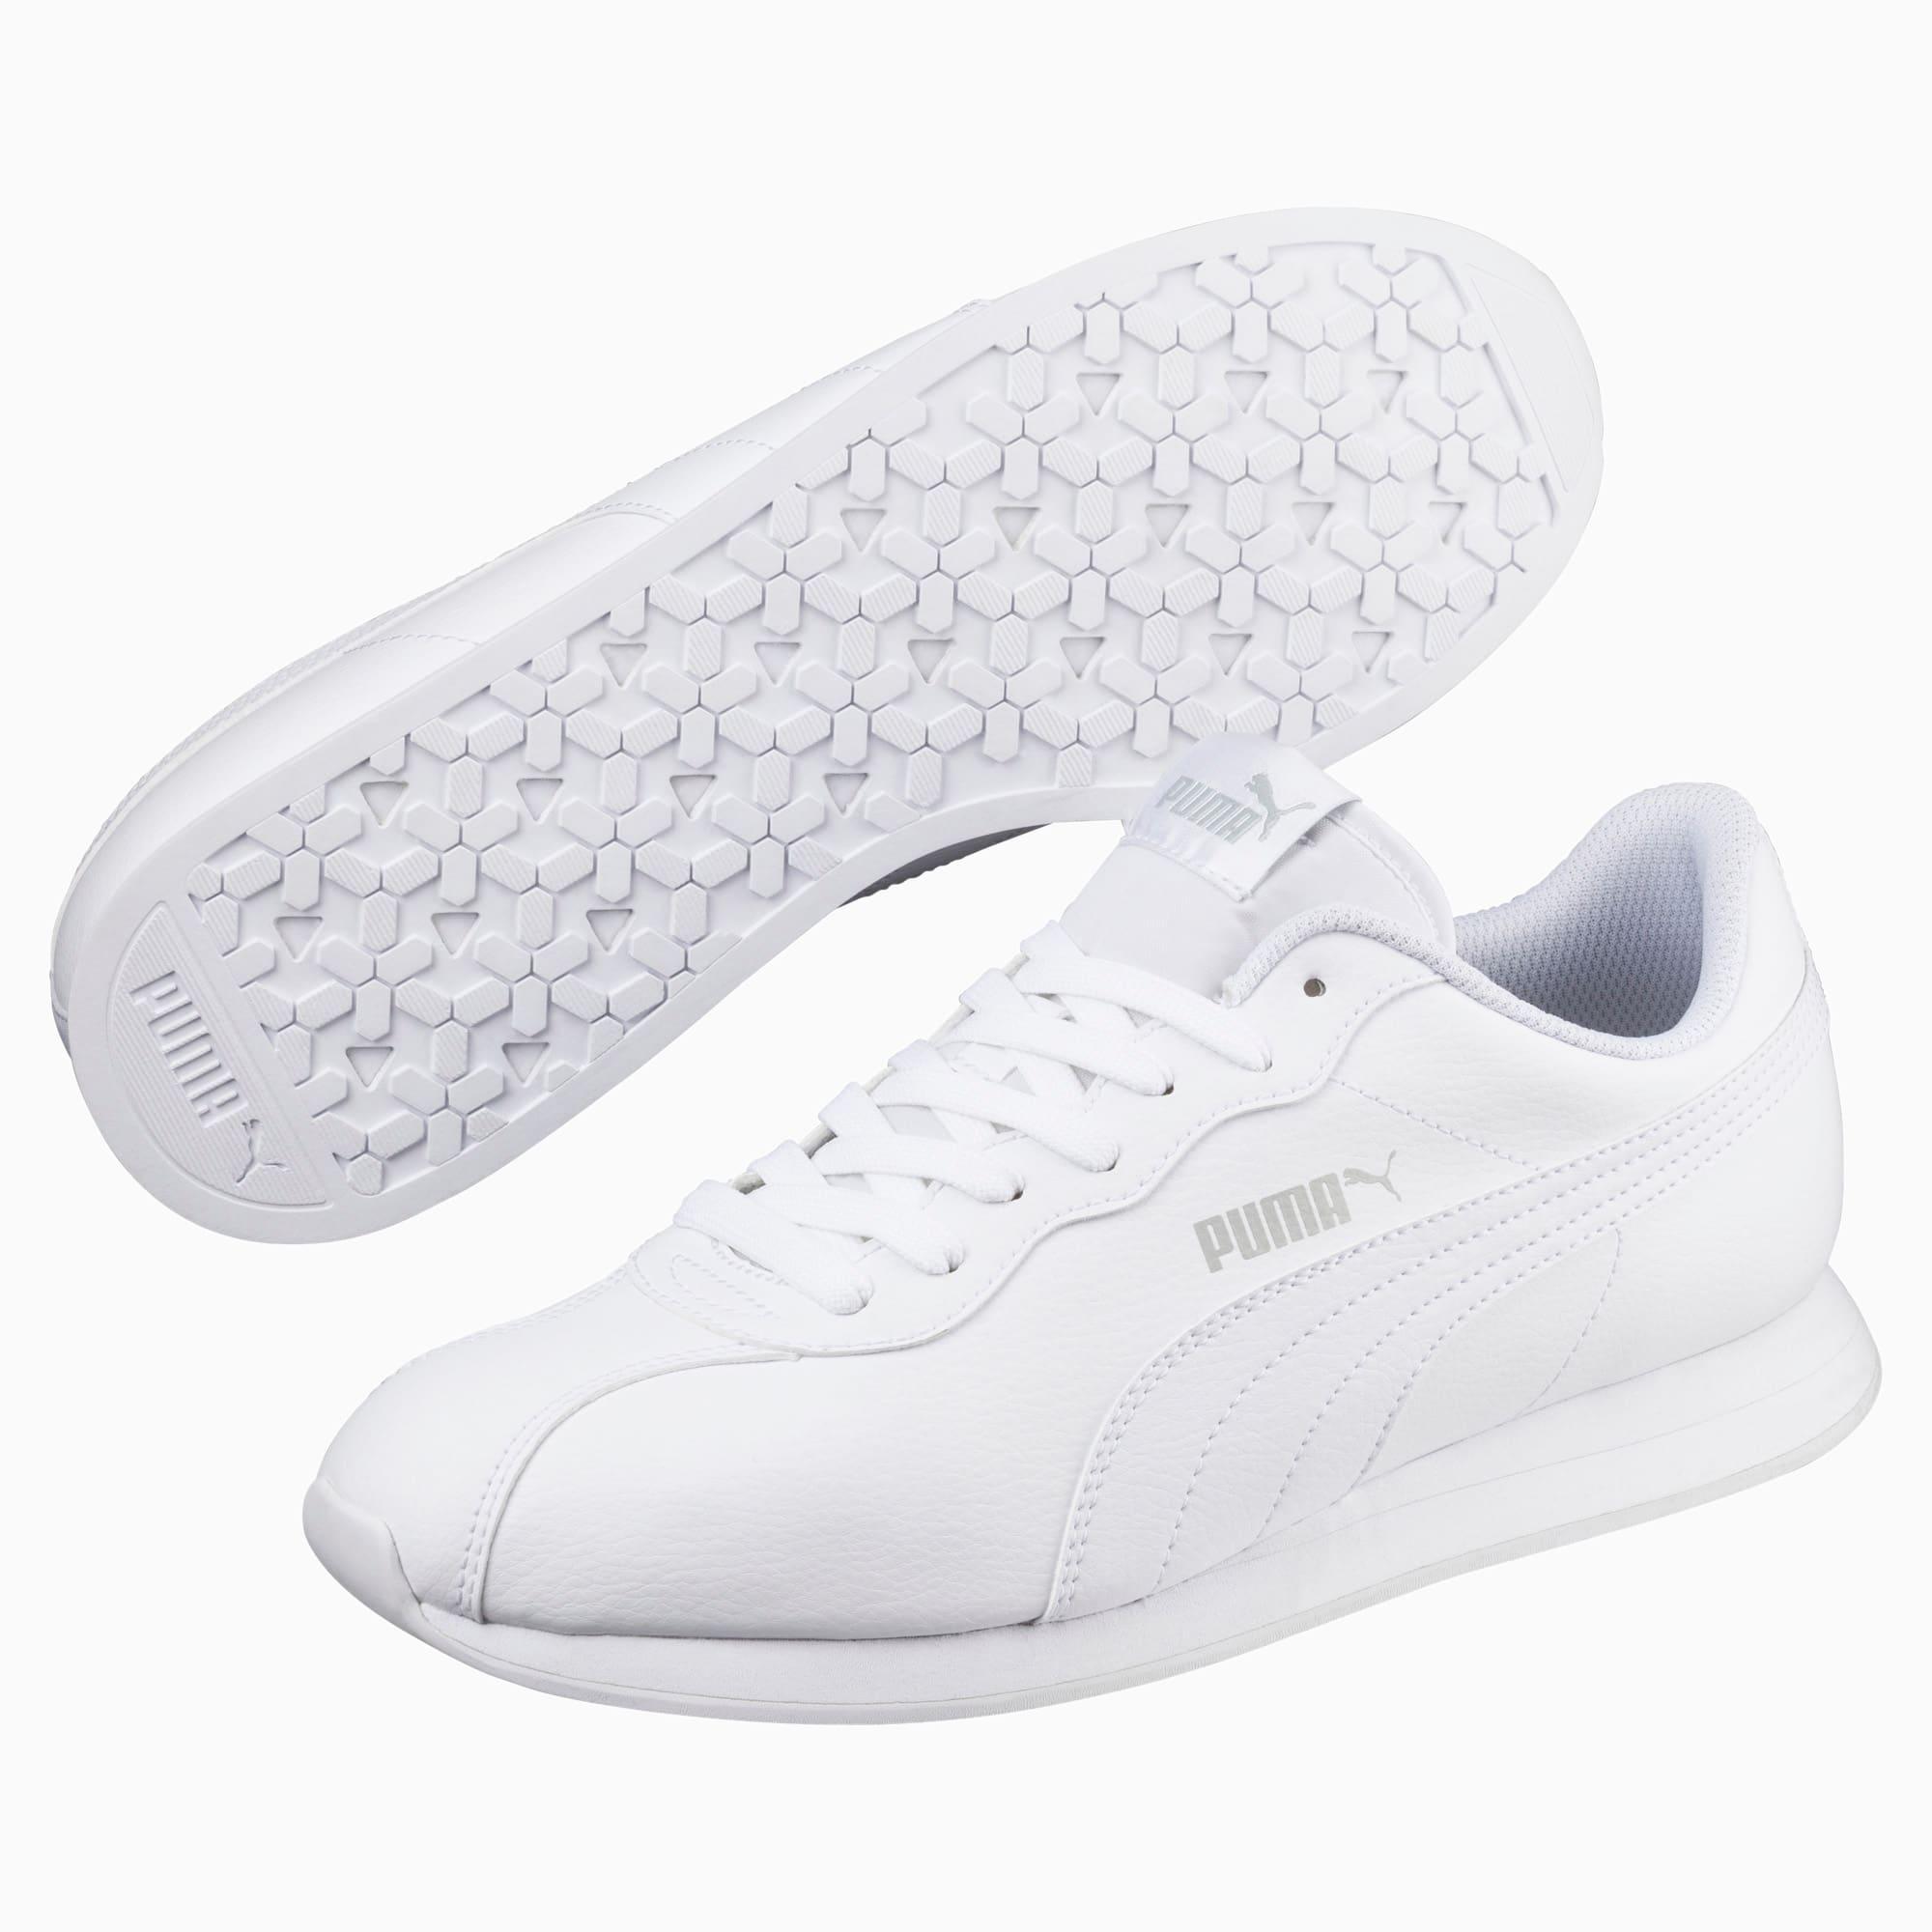 Puma Puma Turin II Sneakers | Shoes